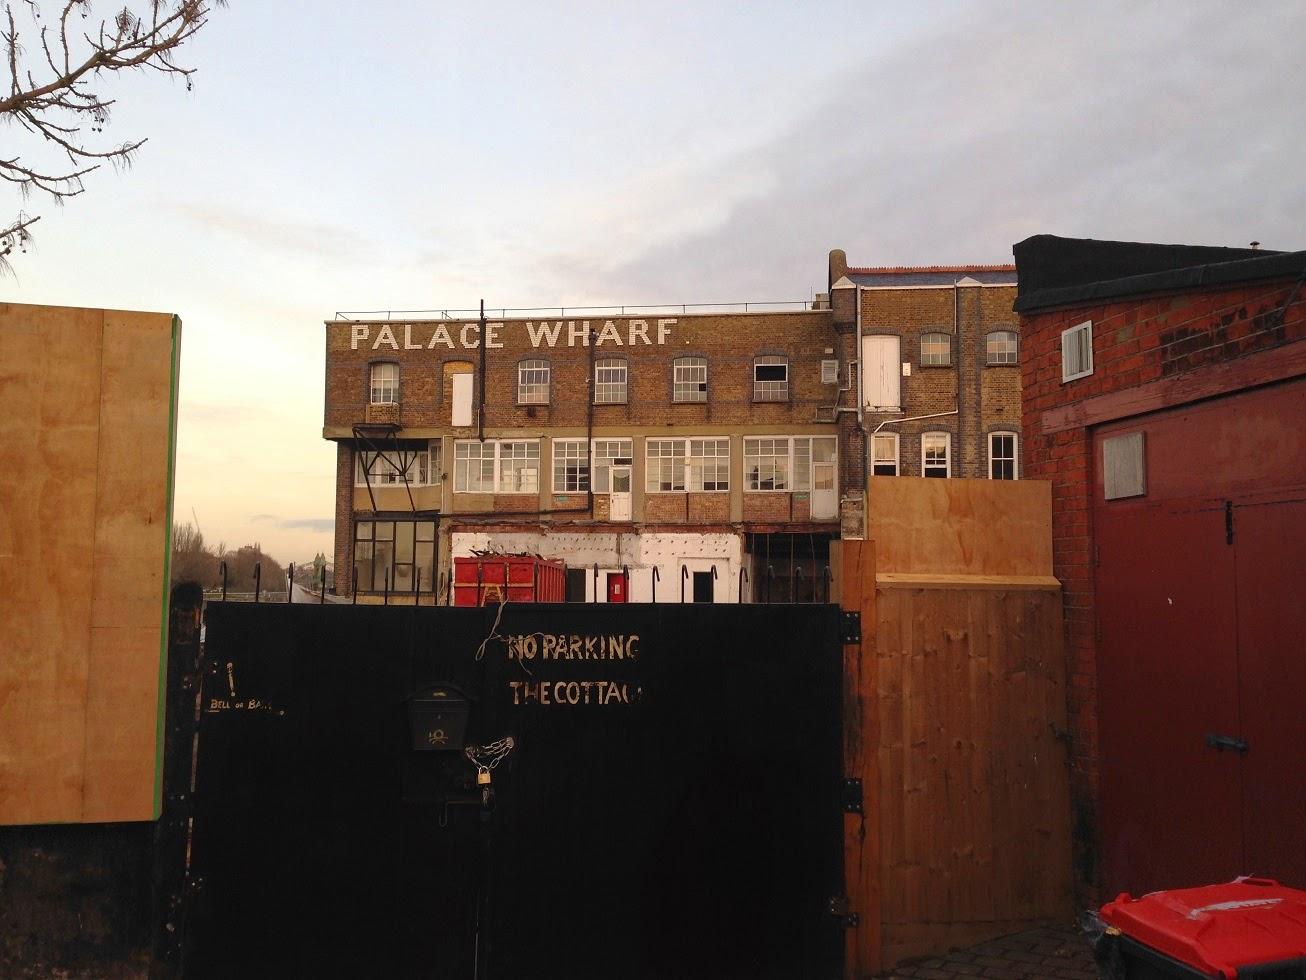 Palace Wharf, Fulham Reach, London